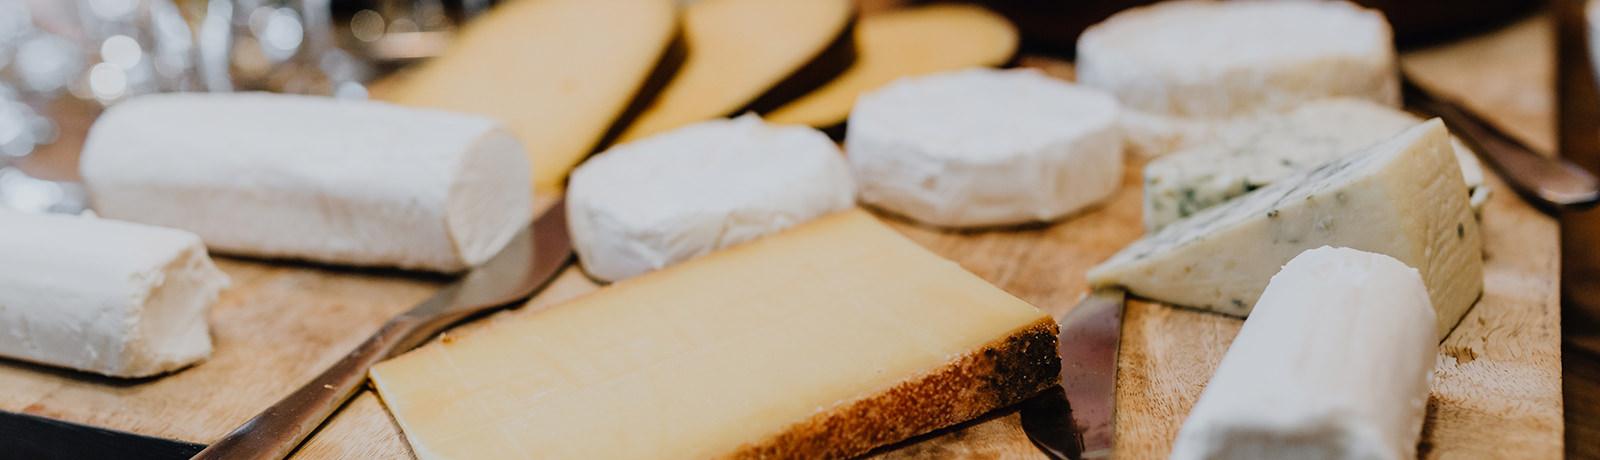 cheese tasting board